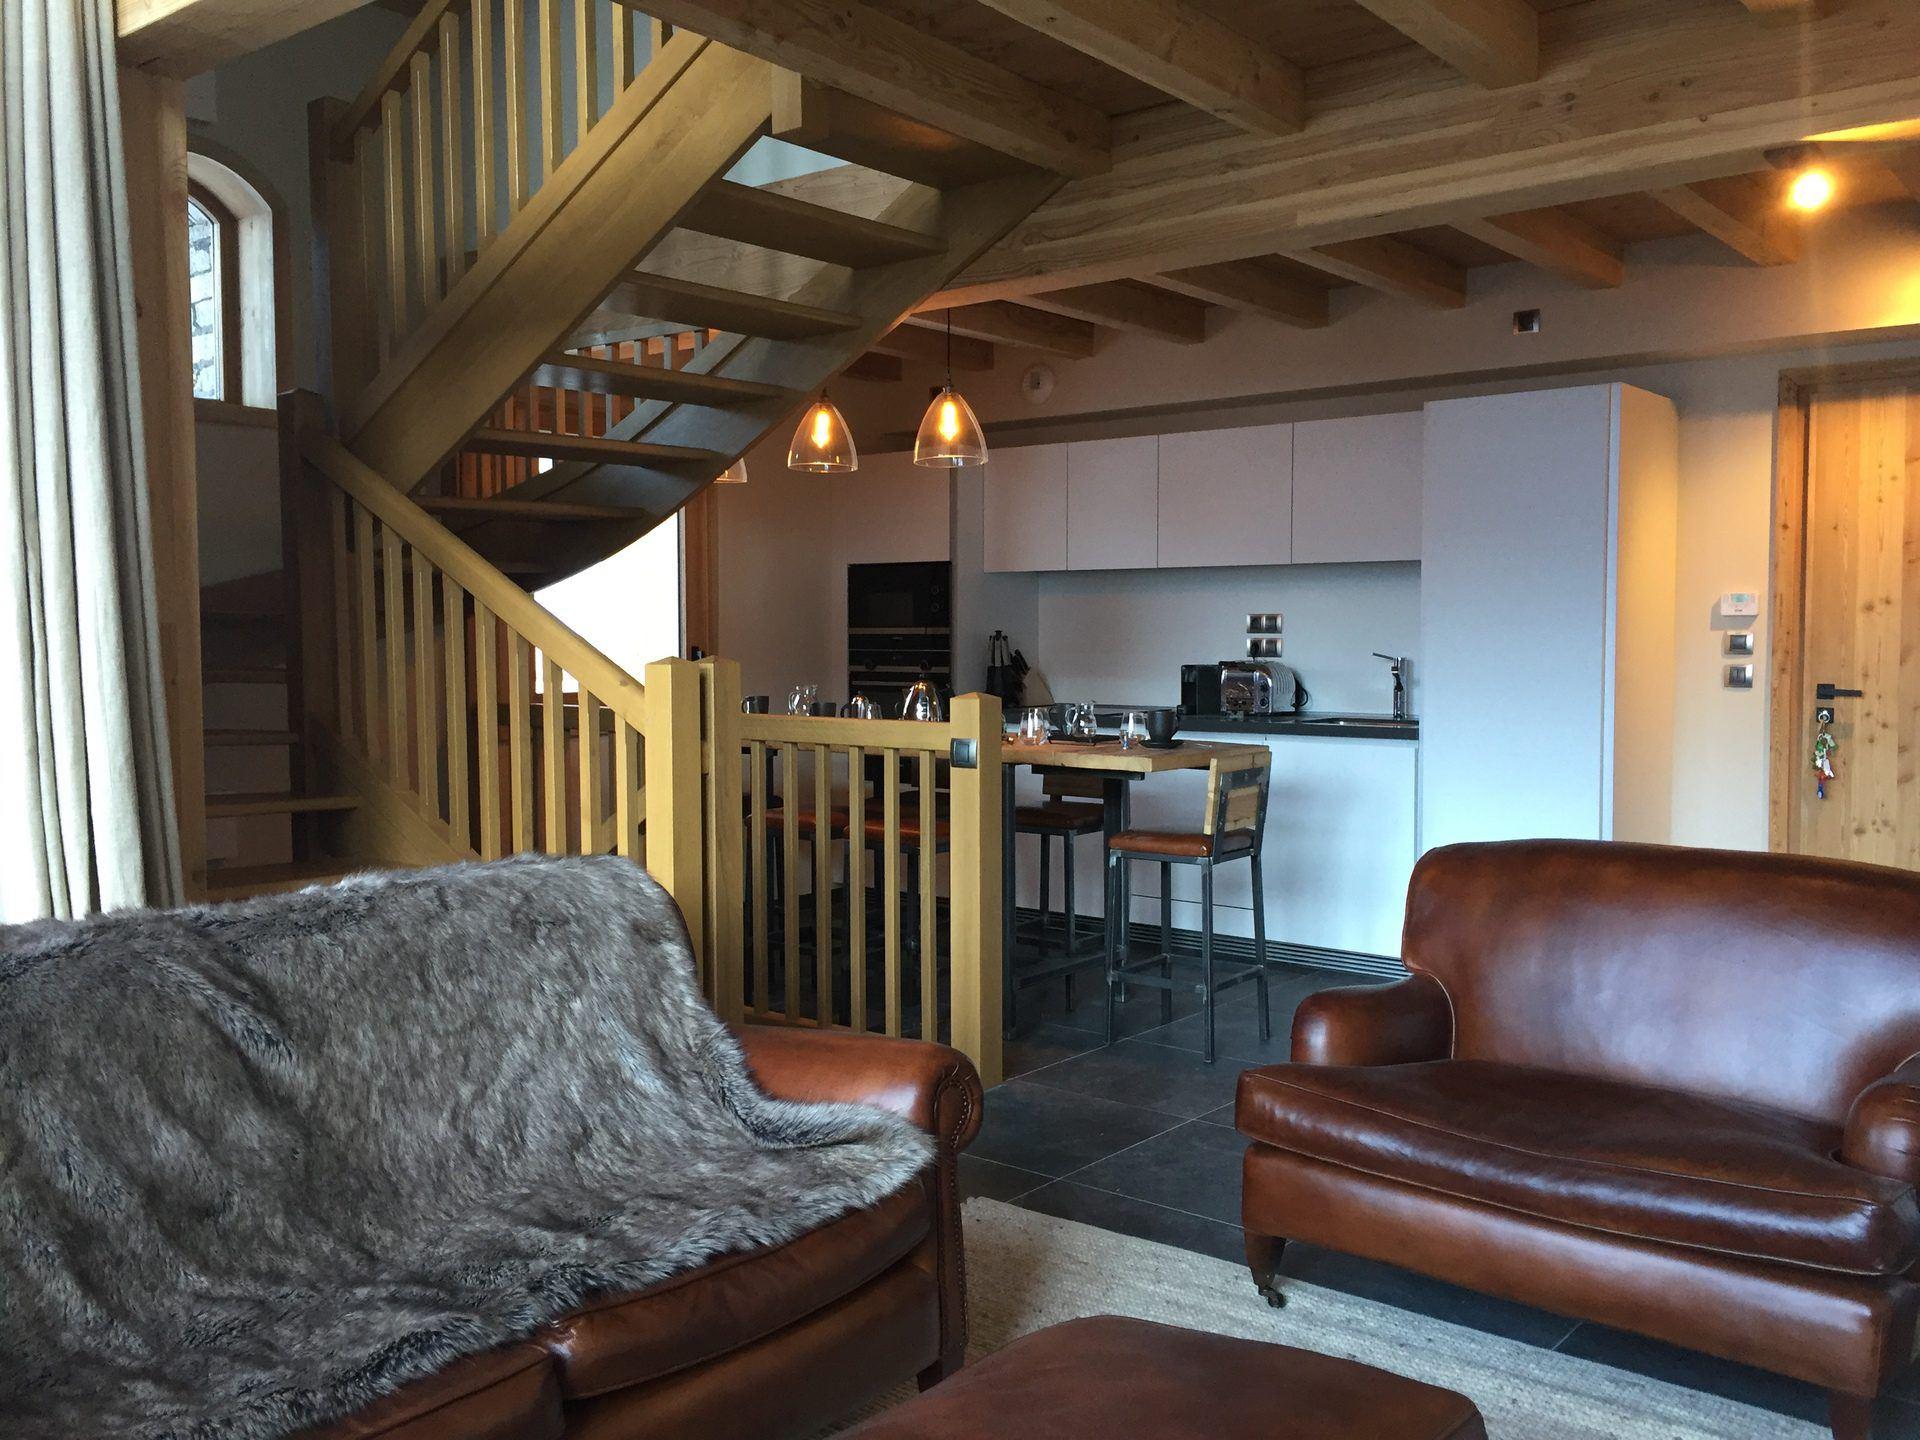 4 Room 6 Pers ski-in ski-out / CASEBLANCHE D19